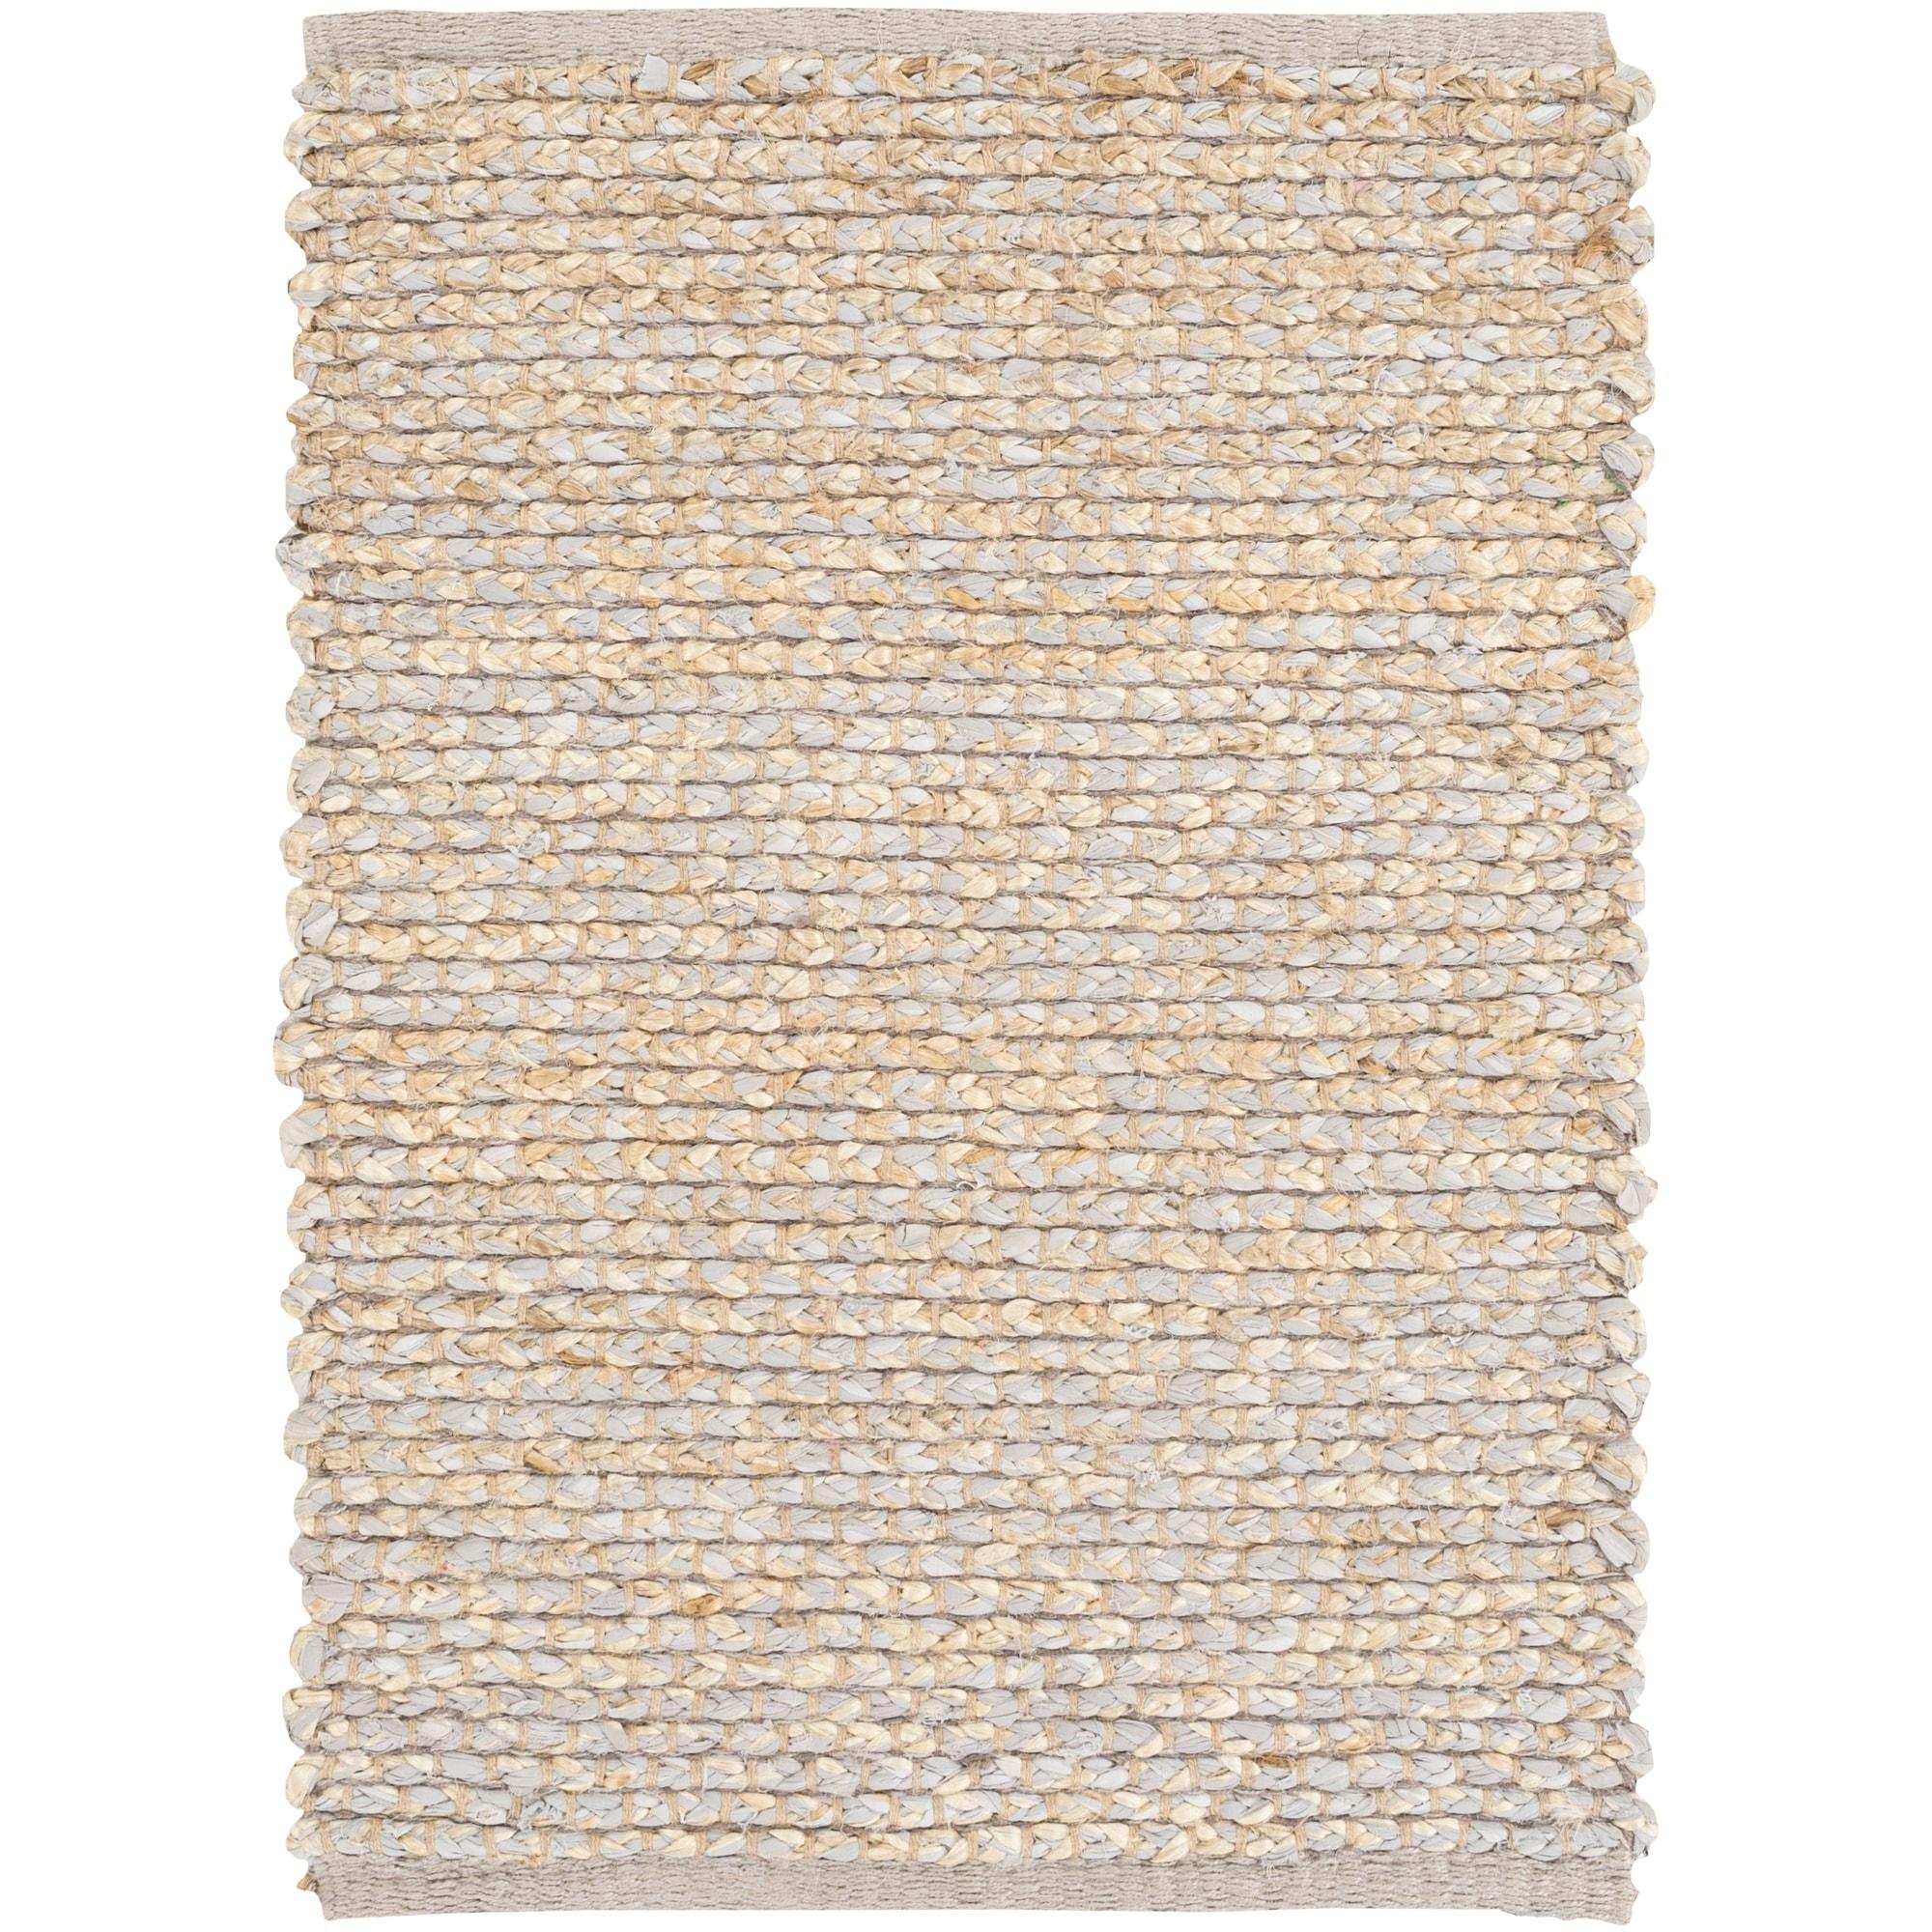 Hand Woven Canadaontario Cotton Seagr Area Rug 2 X 3